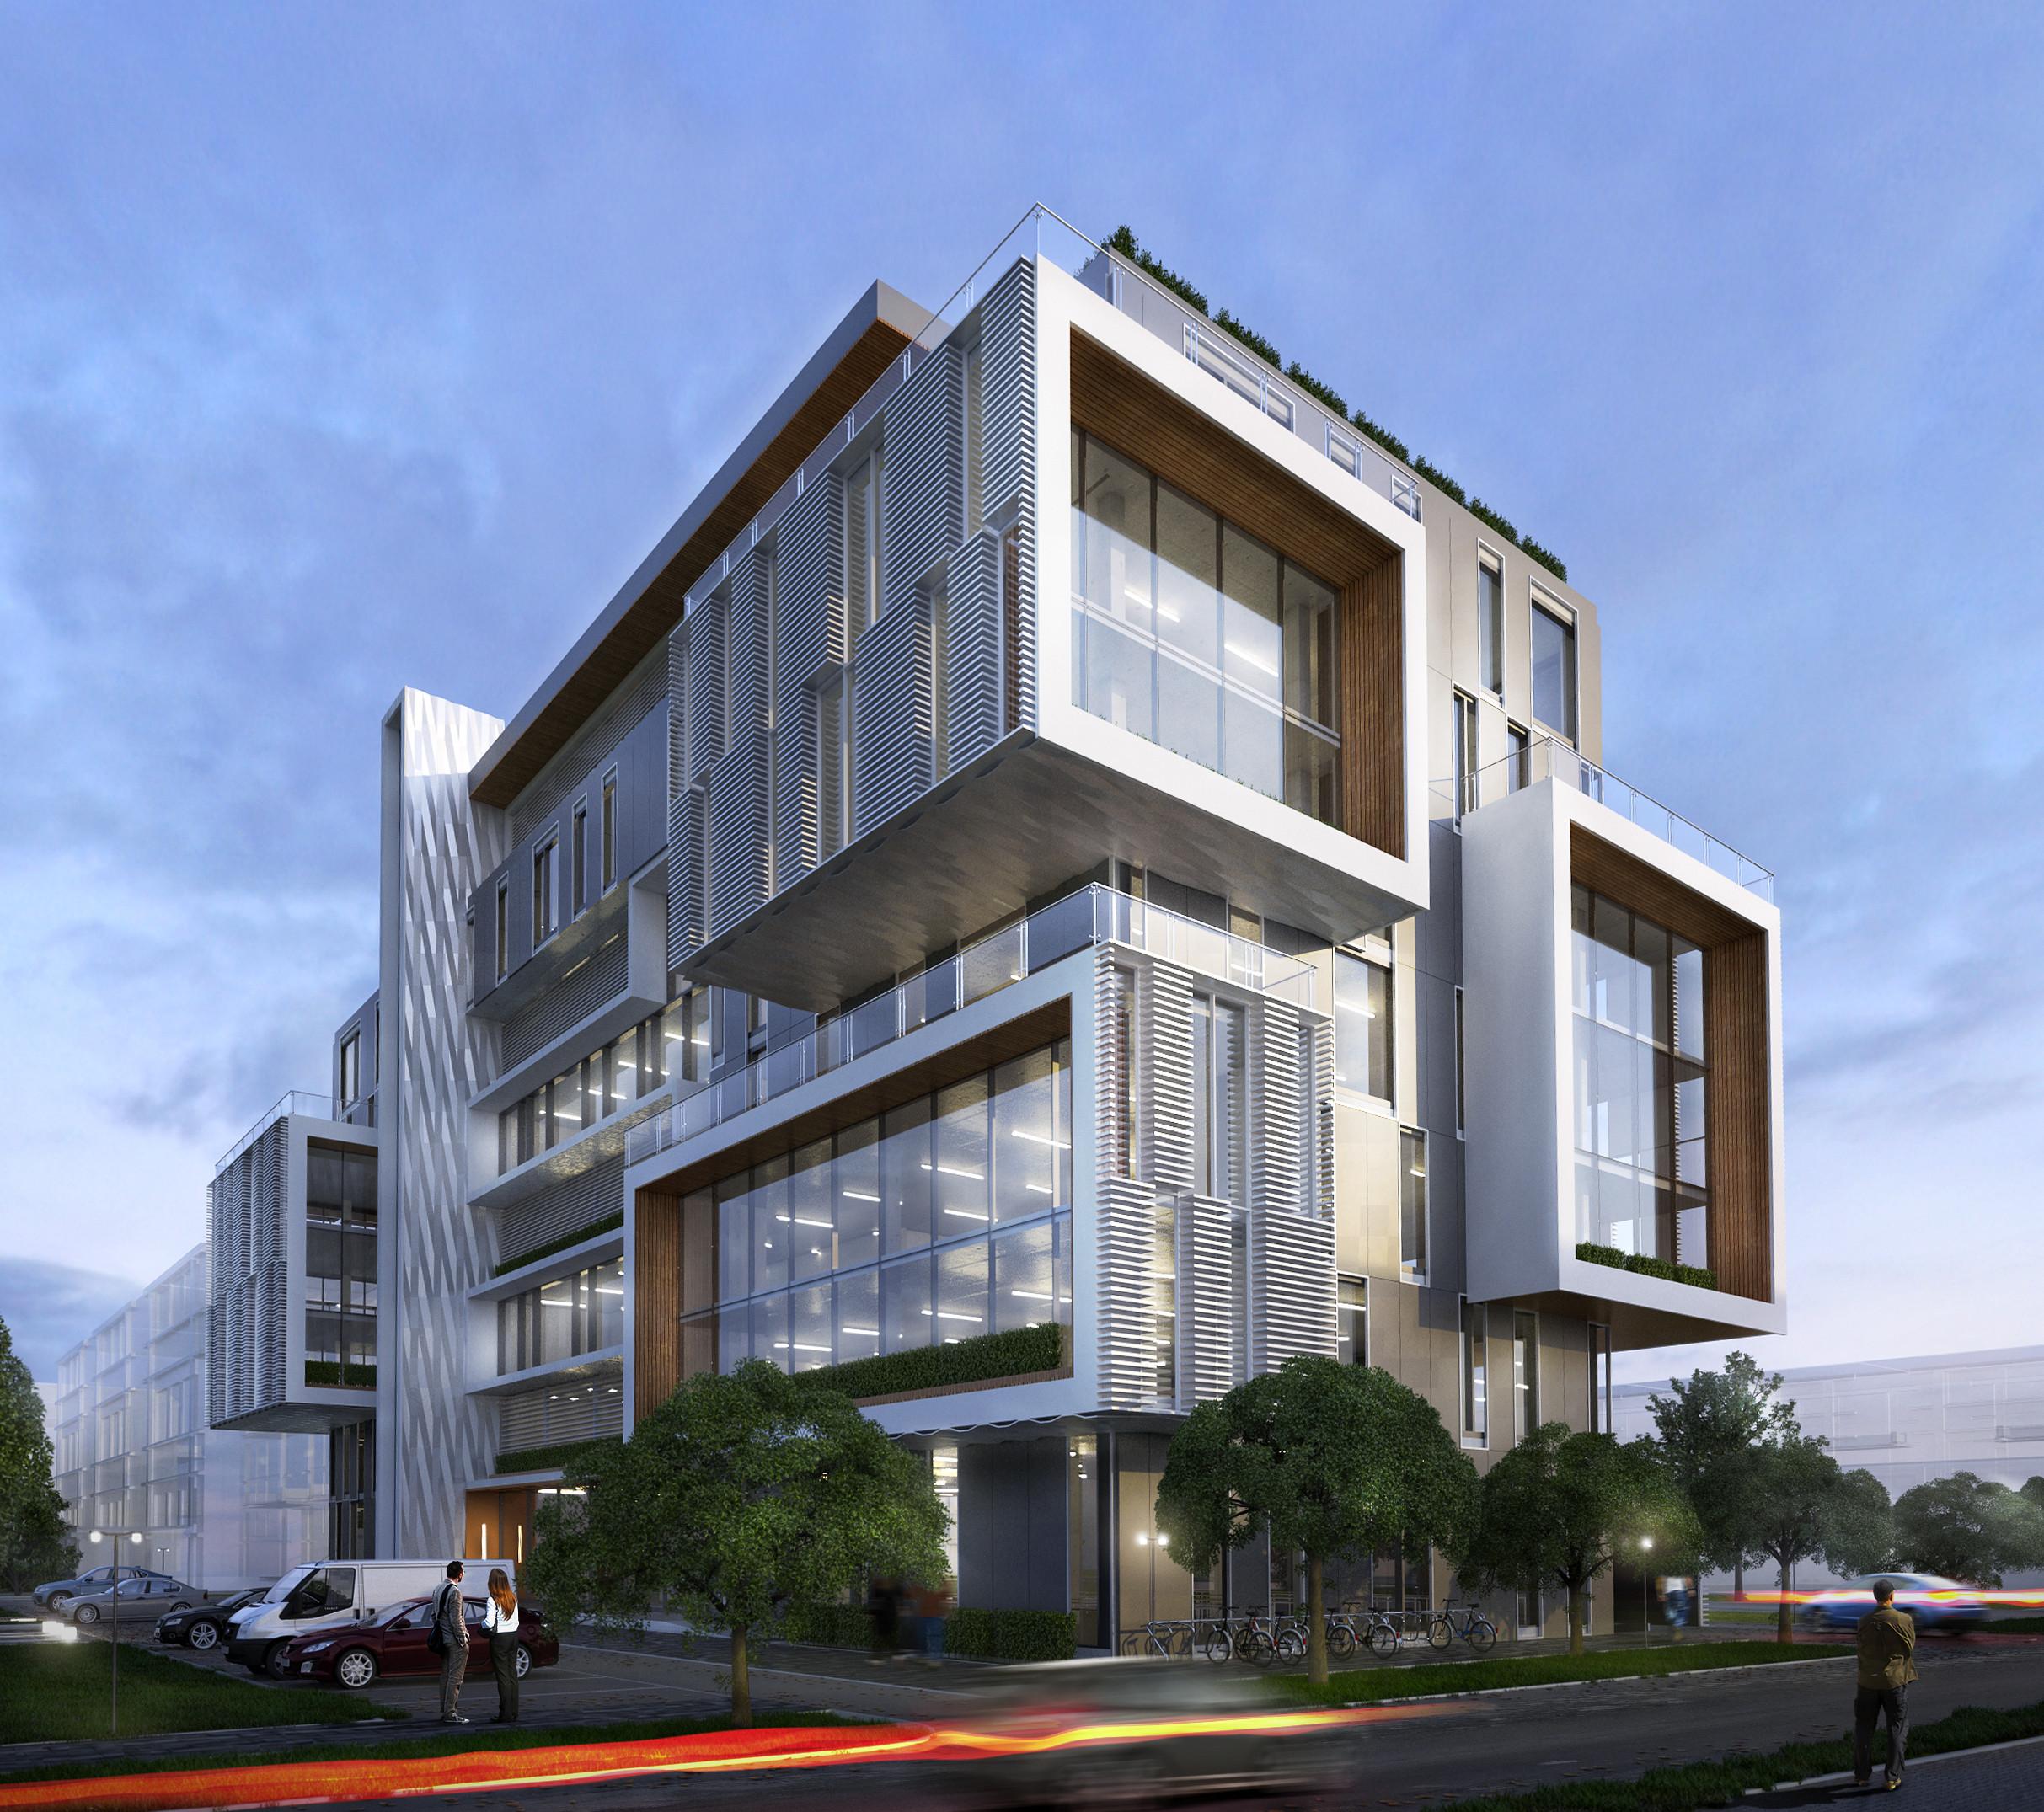 Office building exterior 3d model for Exterior 3d model